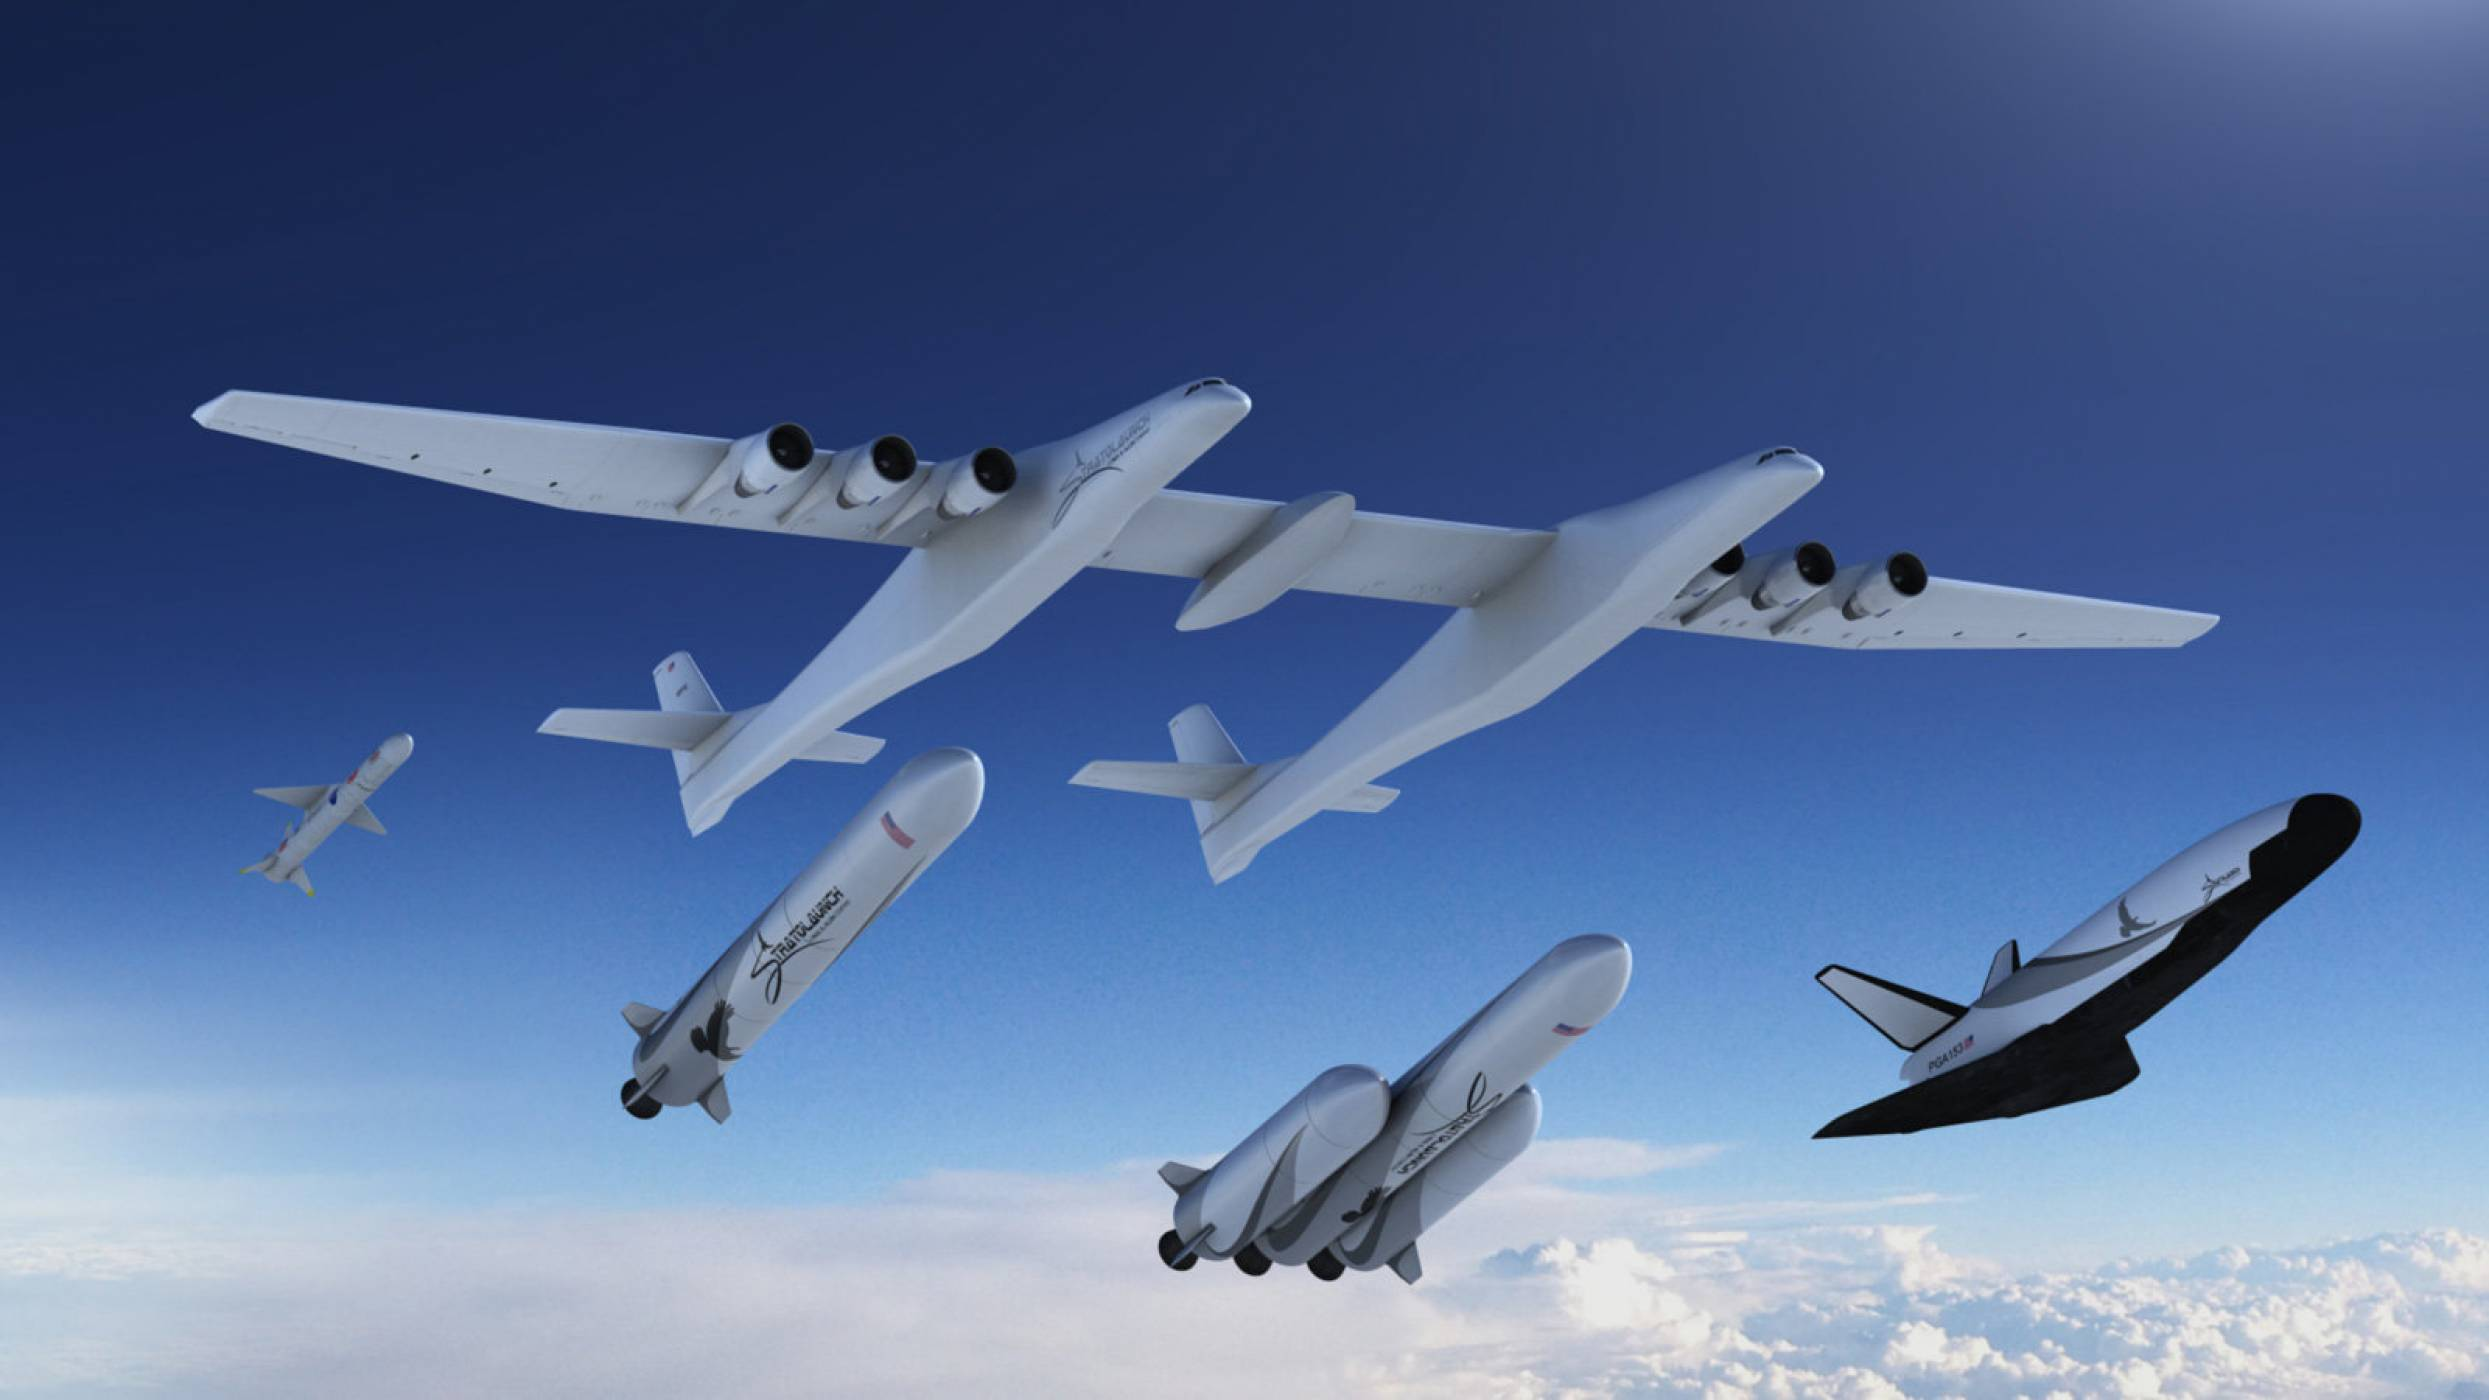 Облаците около самолета гигант Stratolaunch стават все по-непрогледни